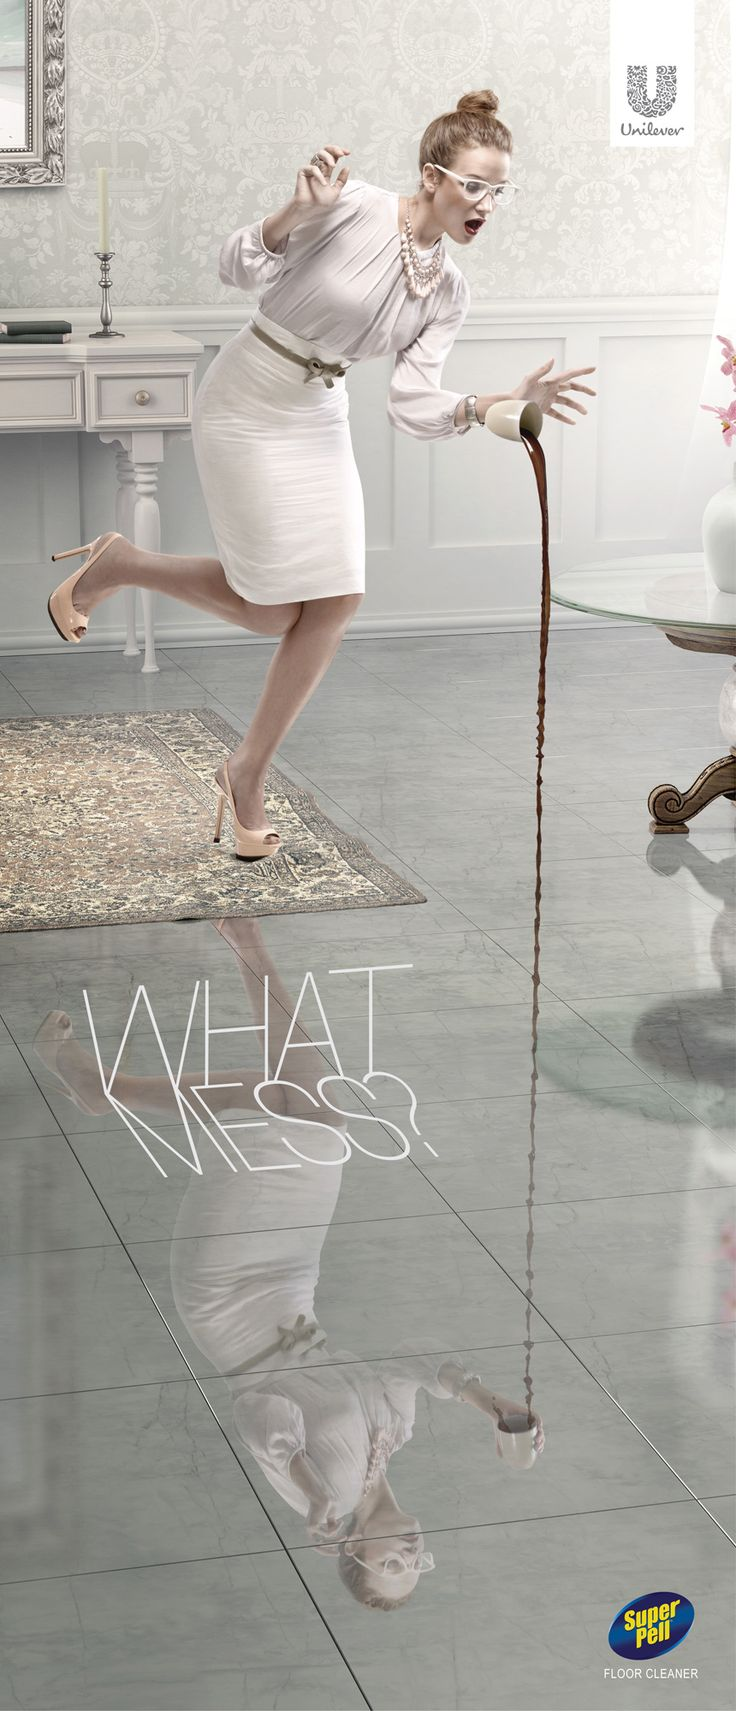 Super Pell Floor Cleaner: No mess, Coffee